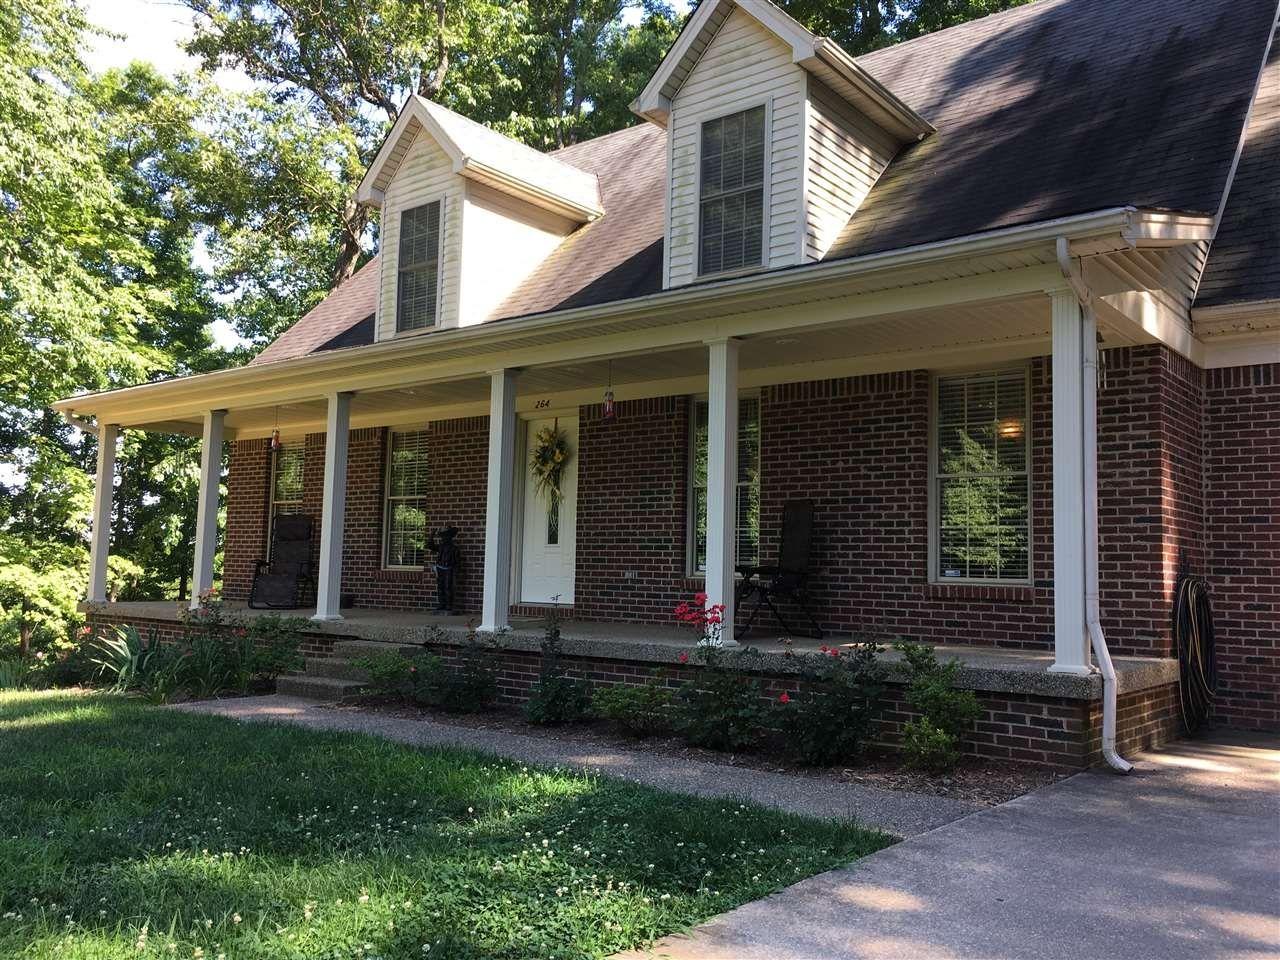 homes for sale breckinridge county ky